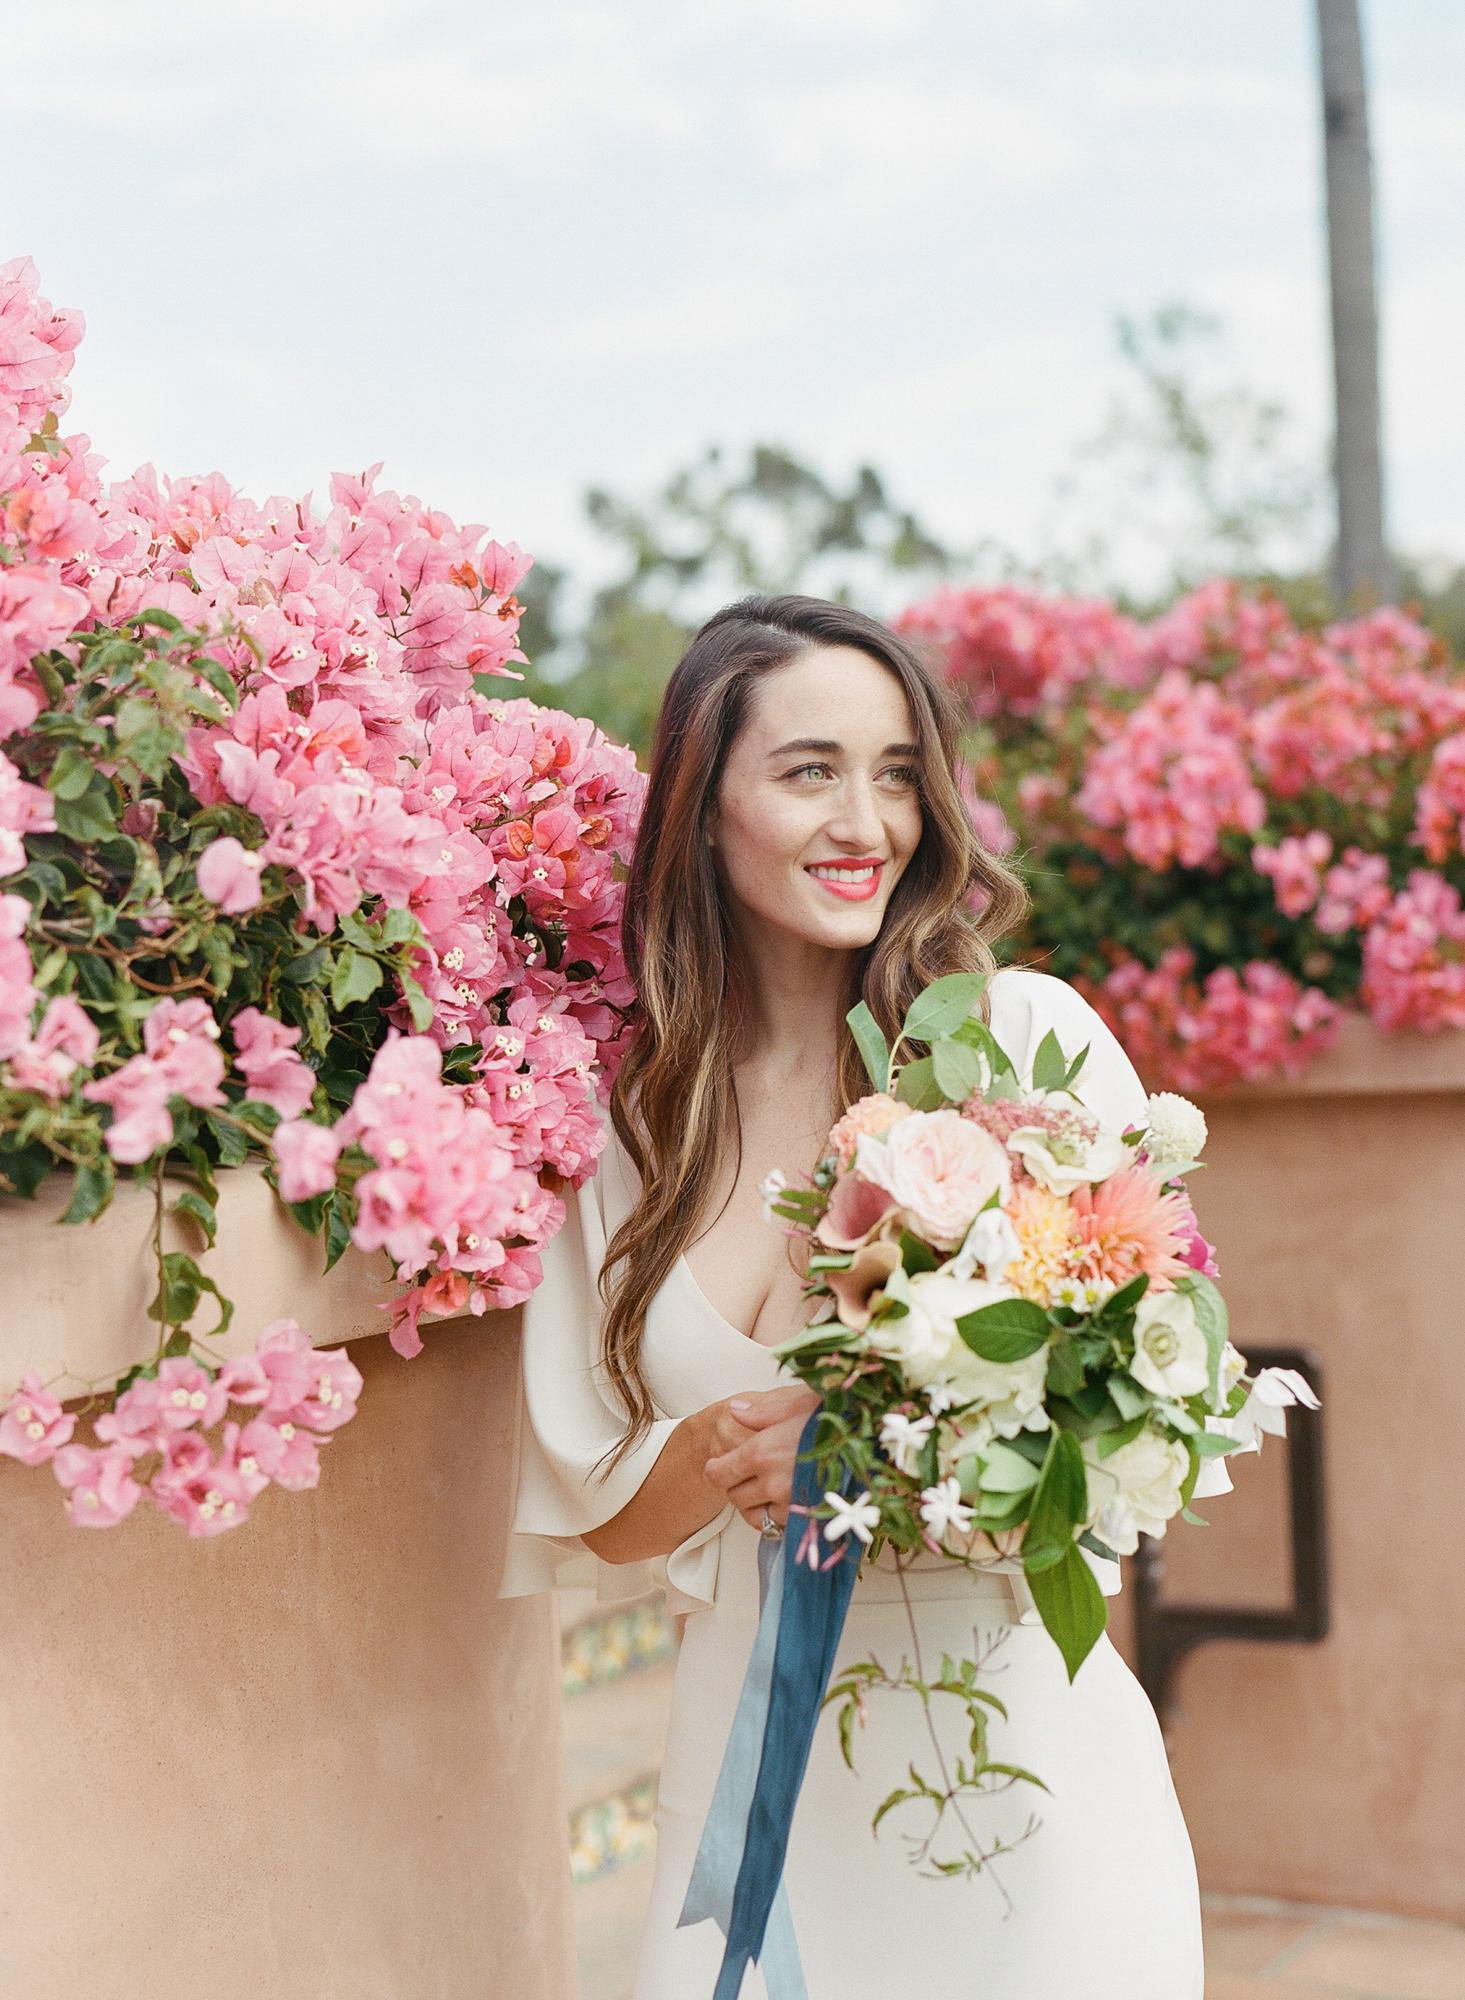 Rancho-Valencia-wedding-blooms-by-breesa-lee-rochelle-cheever-francine-ribeau-luxury-garden-rancho-santa-fe-hey-there-cupcake-adore-folklore-201.JPG